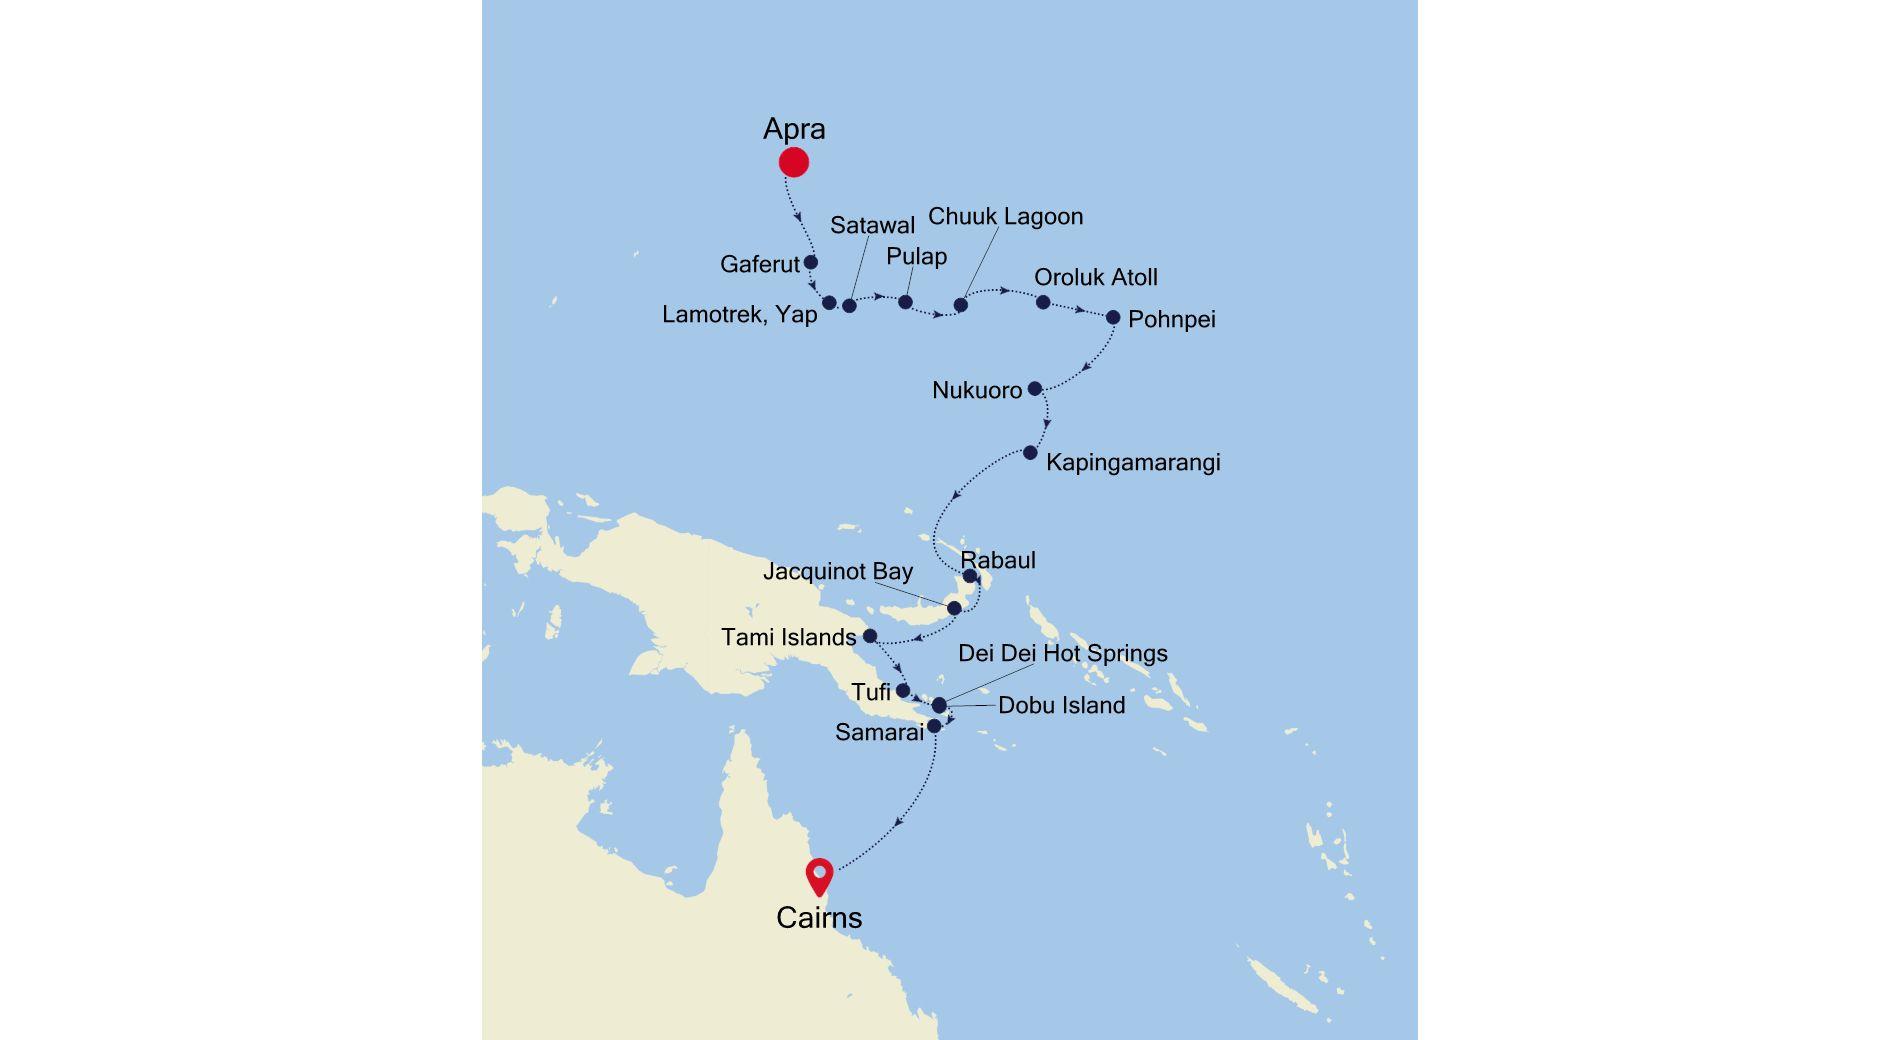 E1210409019 - Apra à Cairns